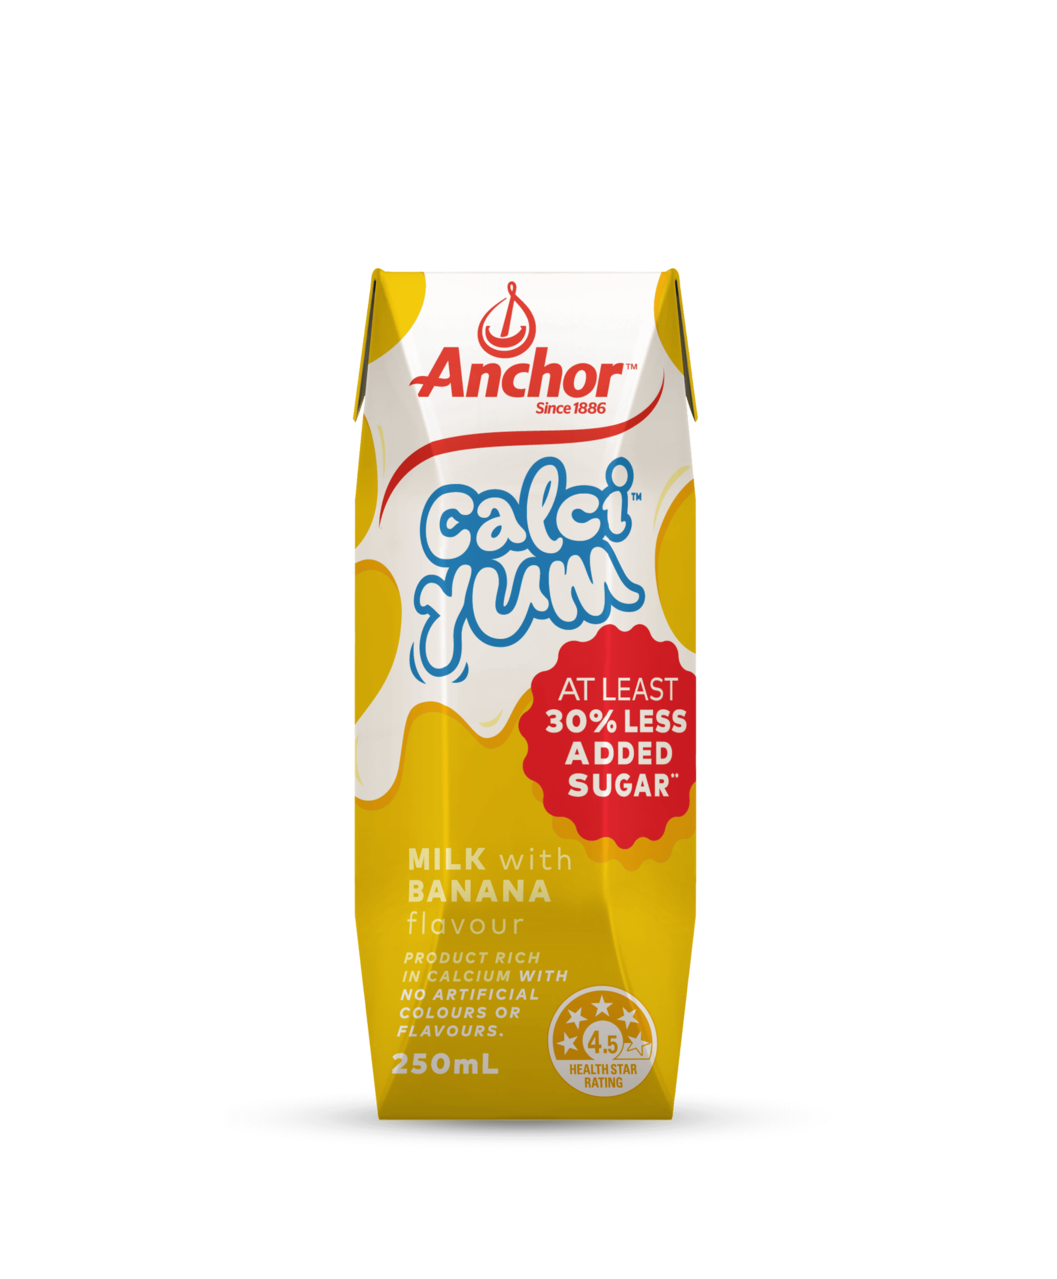 Anchor CalciYum Banana Milk 250mL pack